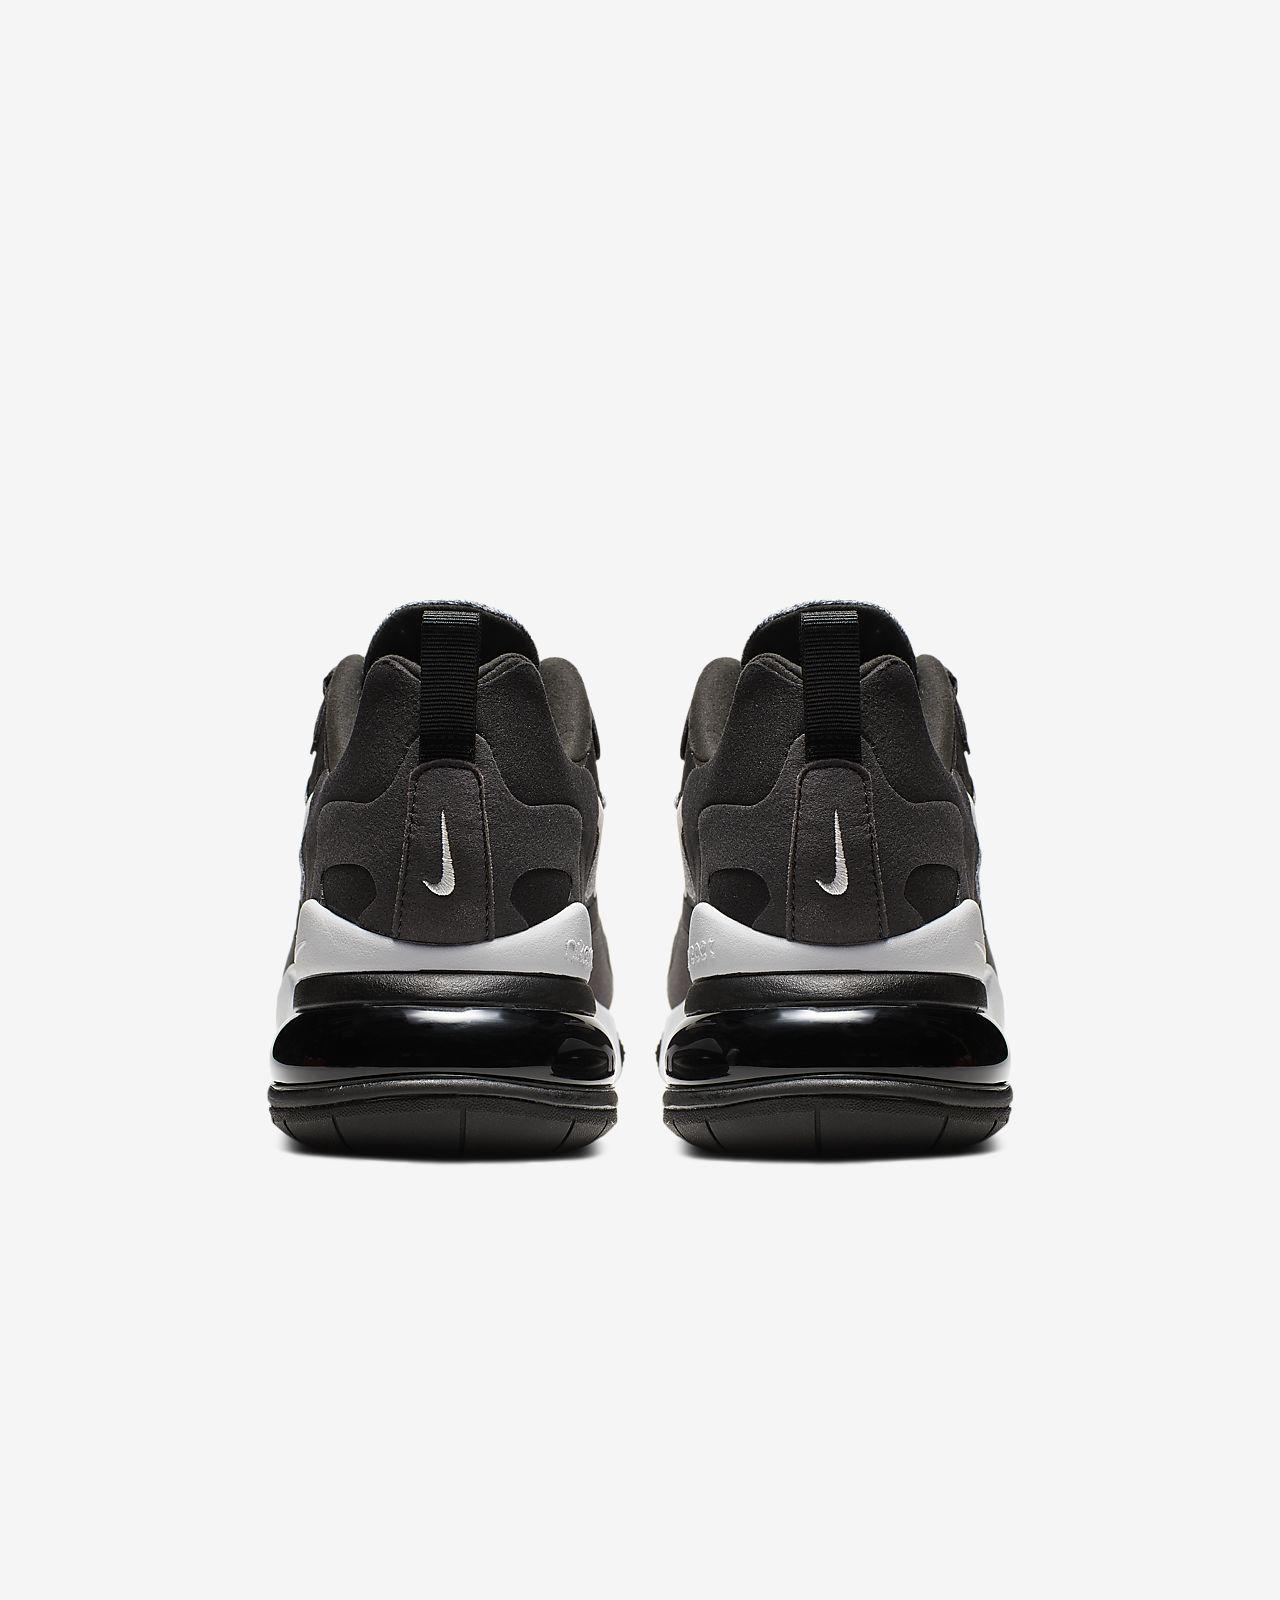 The Nike Air Max 270 React Bauhaus Review {Forum Aden}